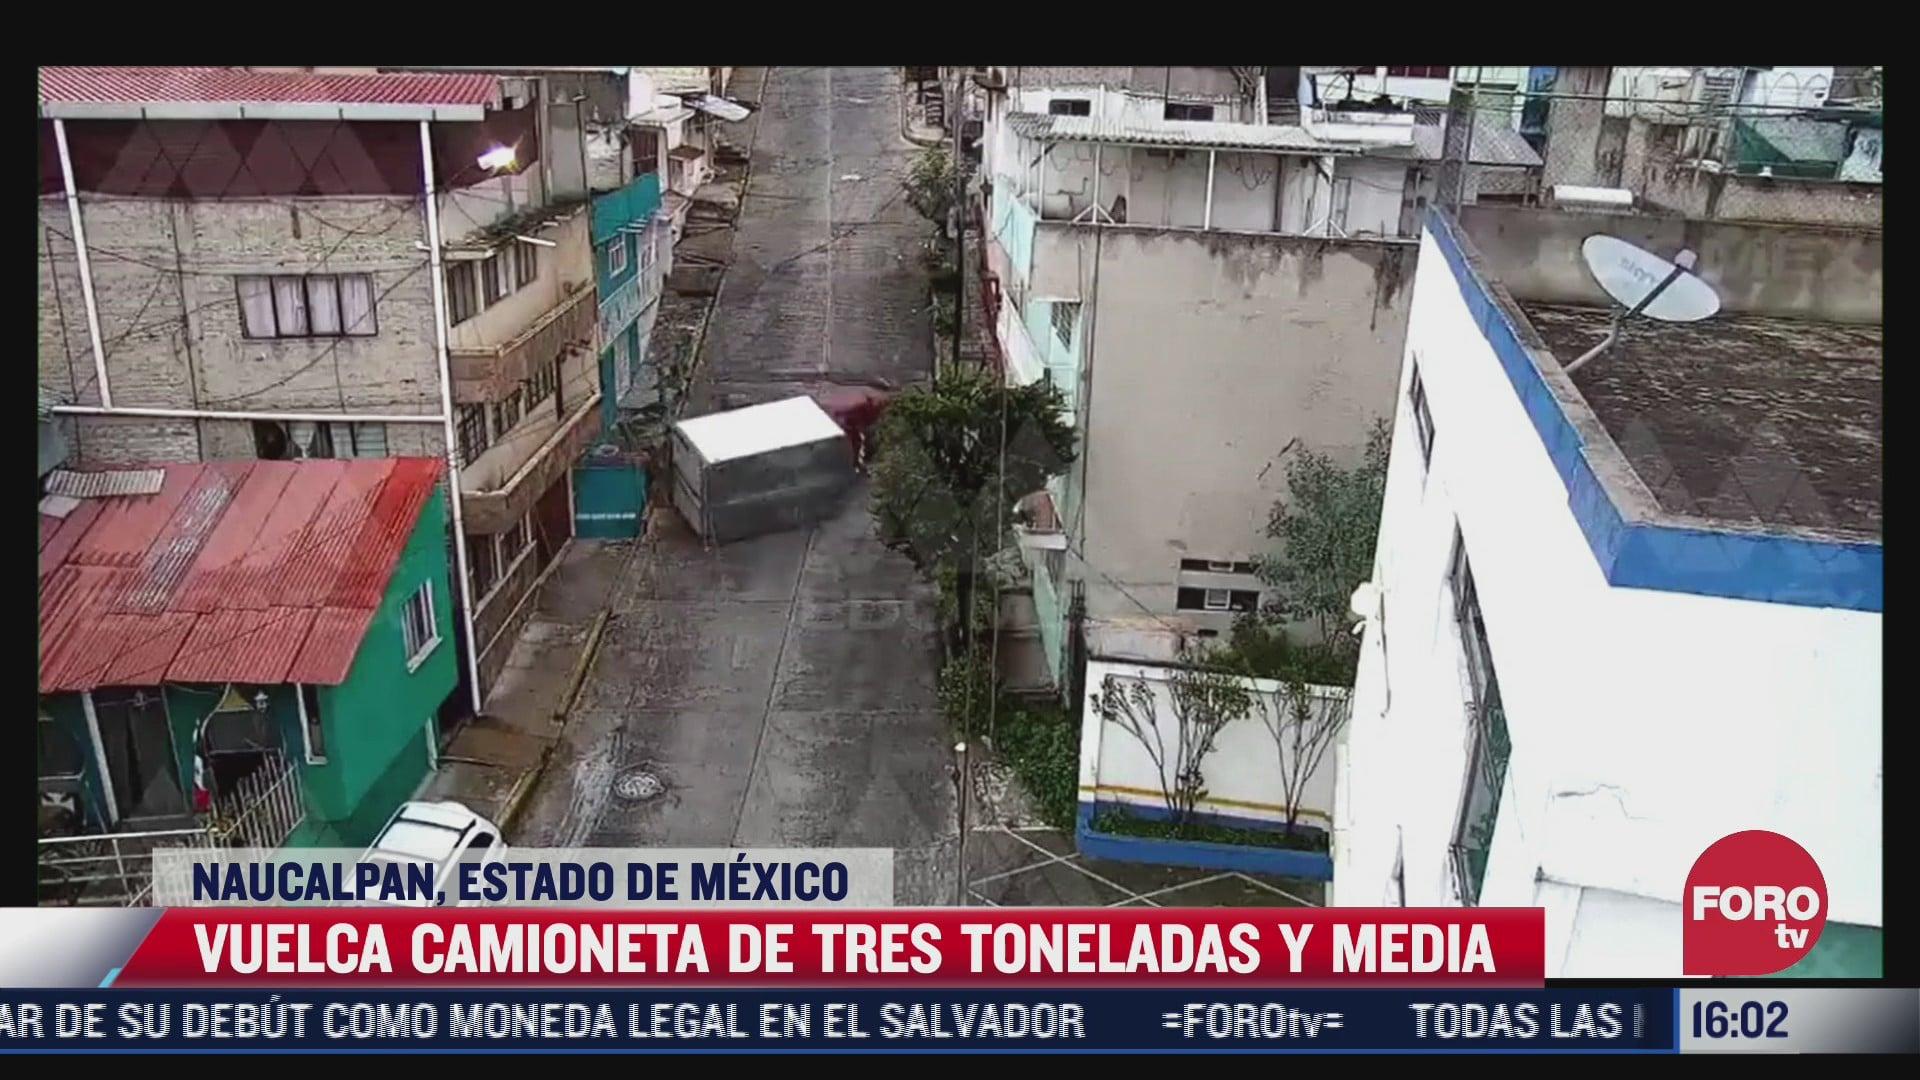 vuelca camioneta de carga en naucalpan en el estado de mexico